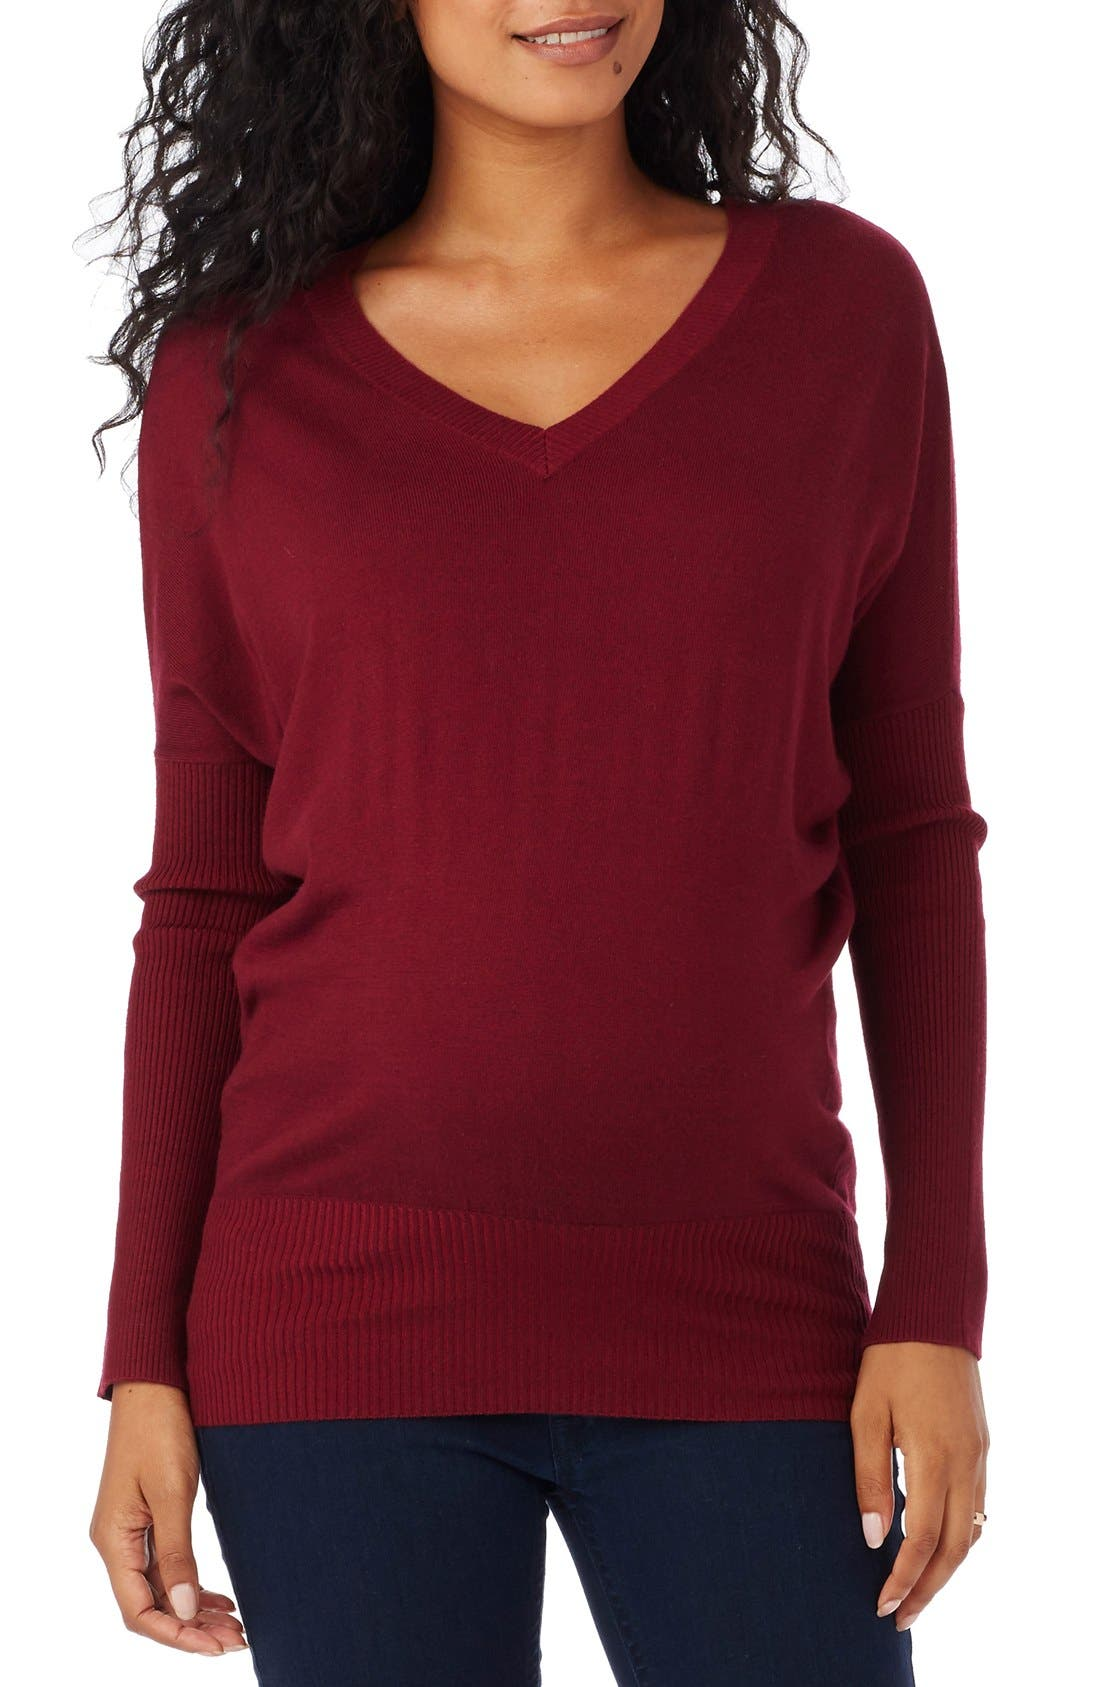 ROSIE POPE V-Neck Maternity Sweater